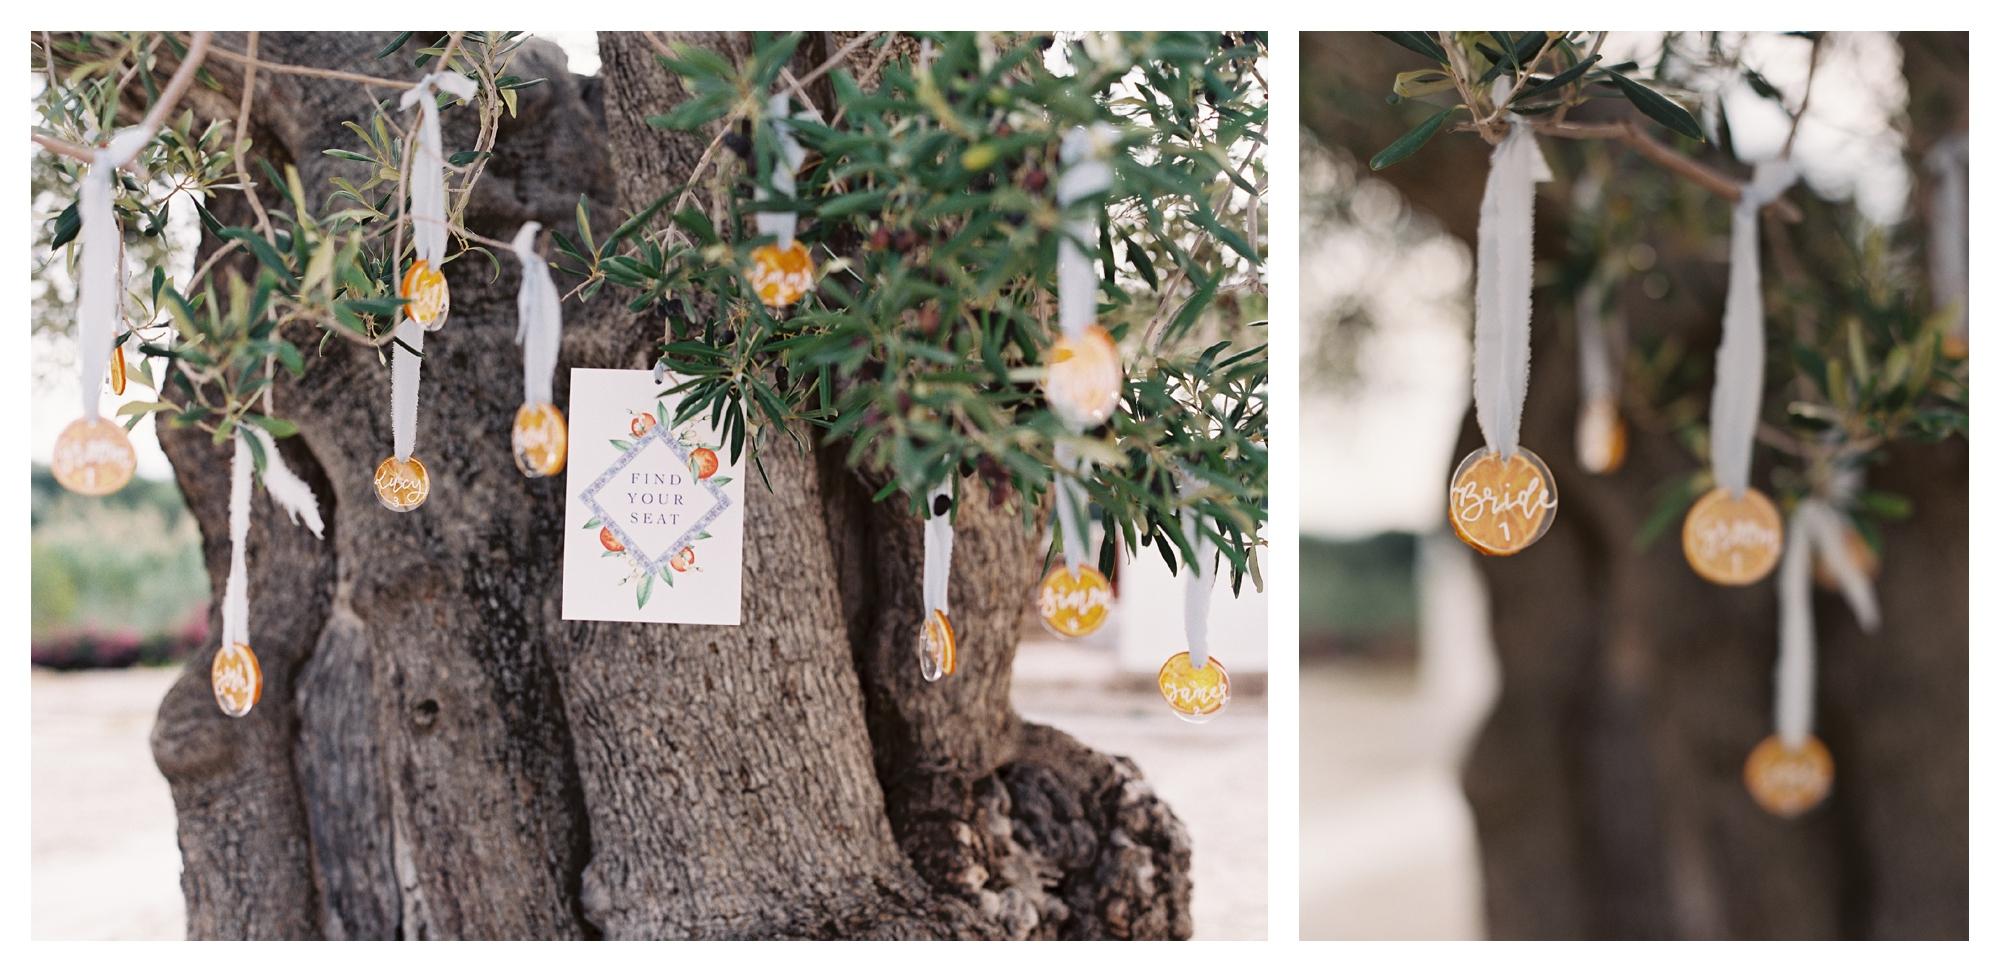 puglia wedding, italy wedding, escot cards display, wedding reception deocr, olive tree escot cards